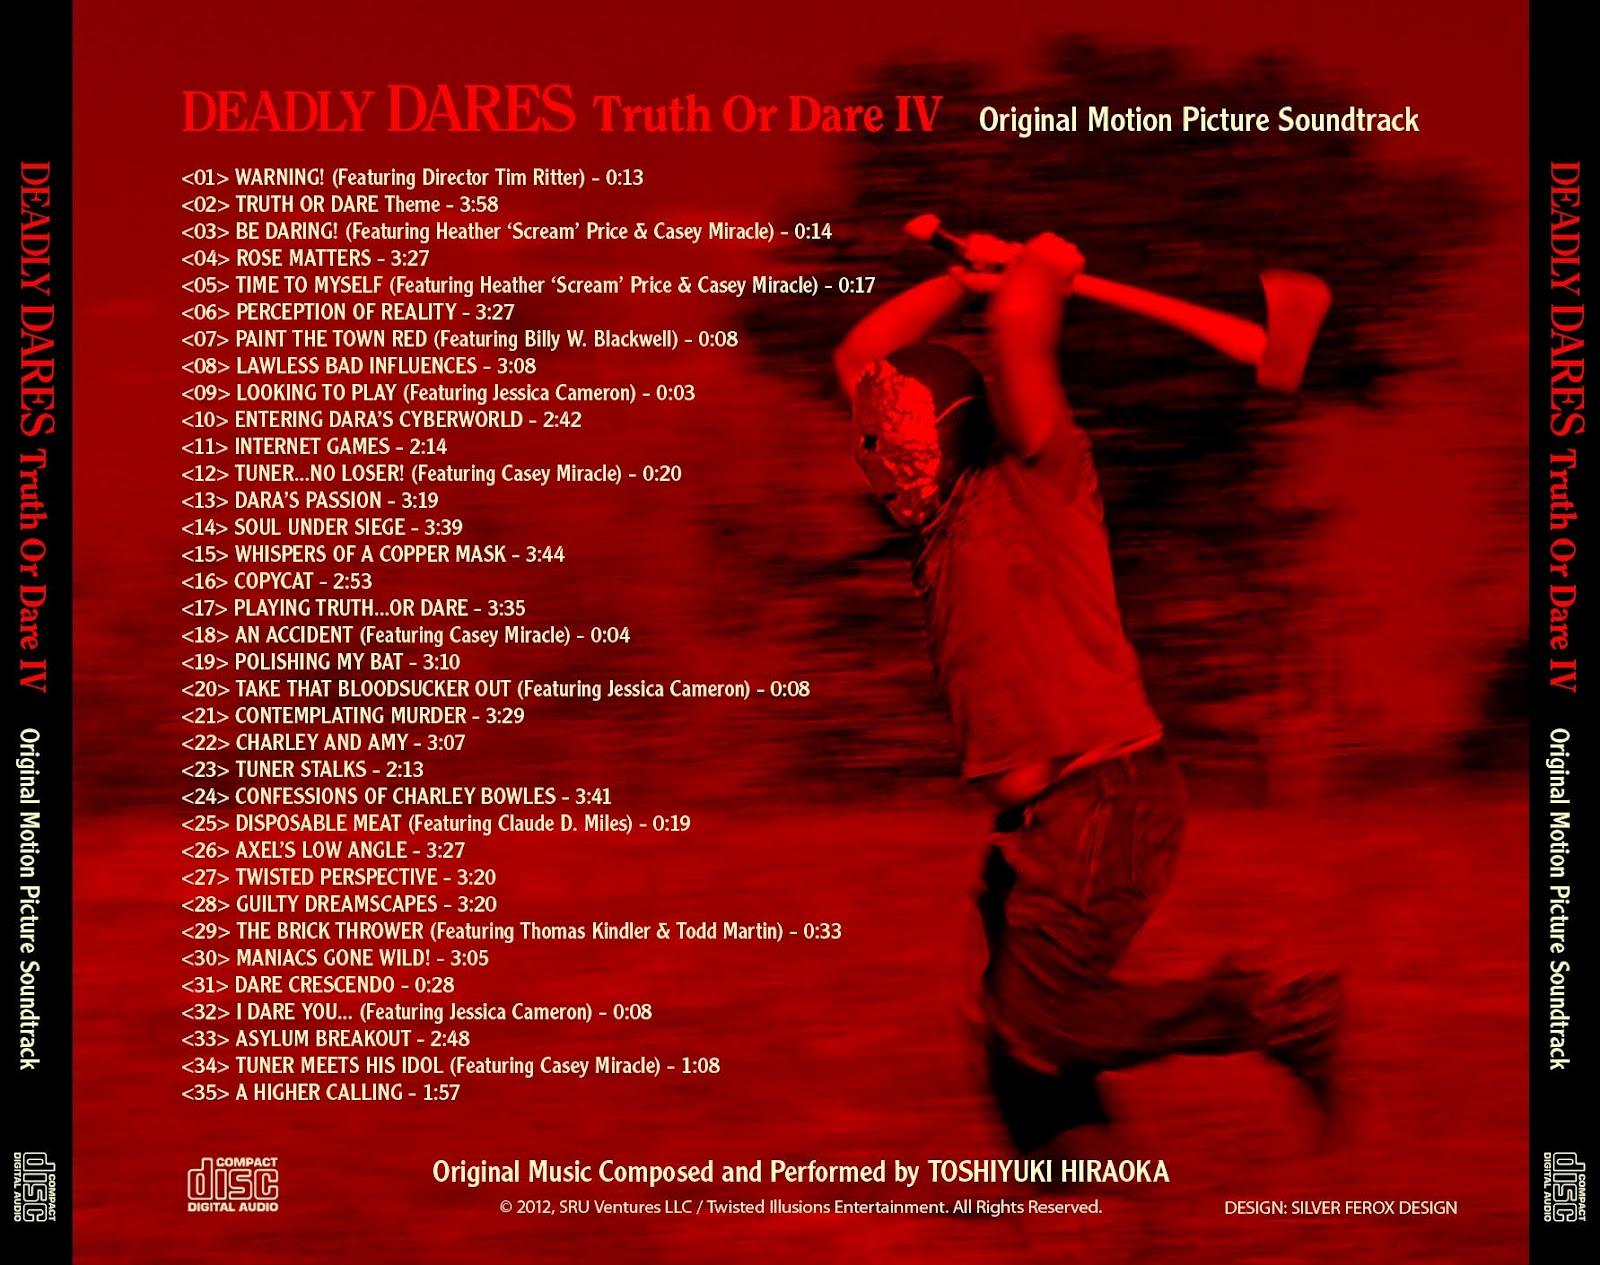 deadly dares truth or dare iv original soundtrack toshiyuki hiraoka 2011